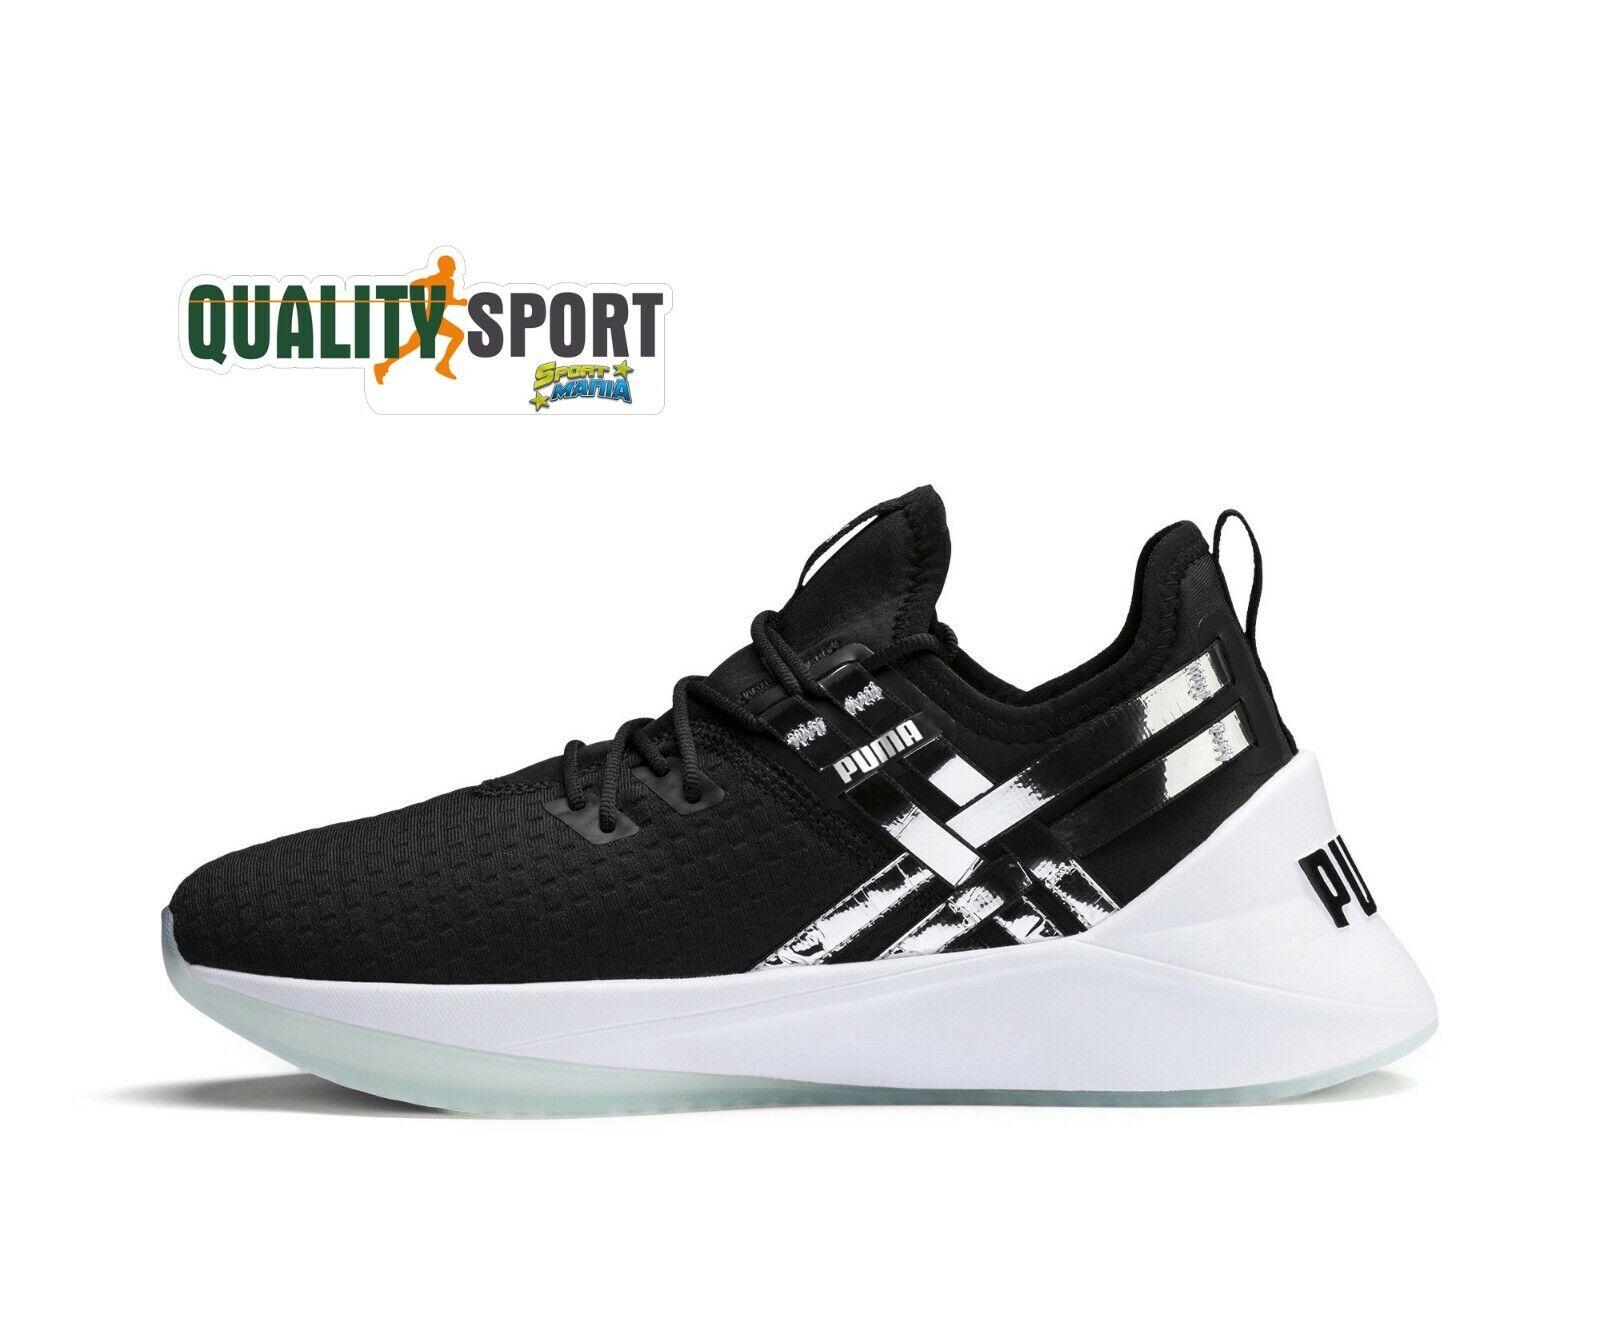 Puma Jaab XT TZ Nero Adriana Lima Lima Lima Scarpe Donna Sportive scarpe da ginnastica 192239 01 2019 004856